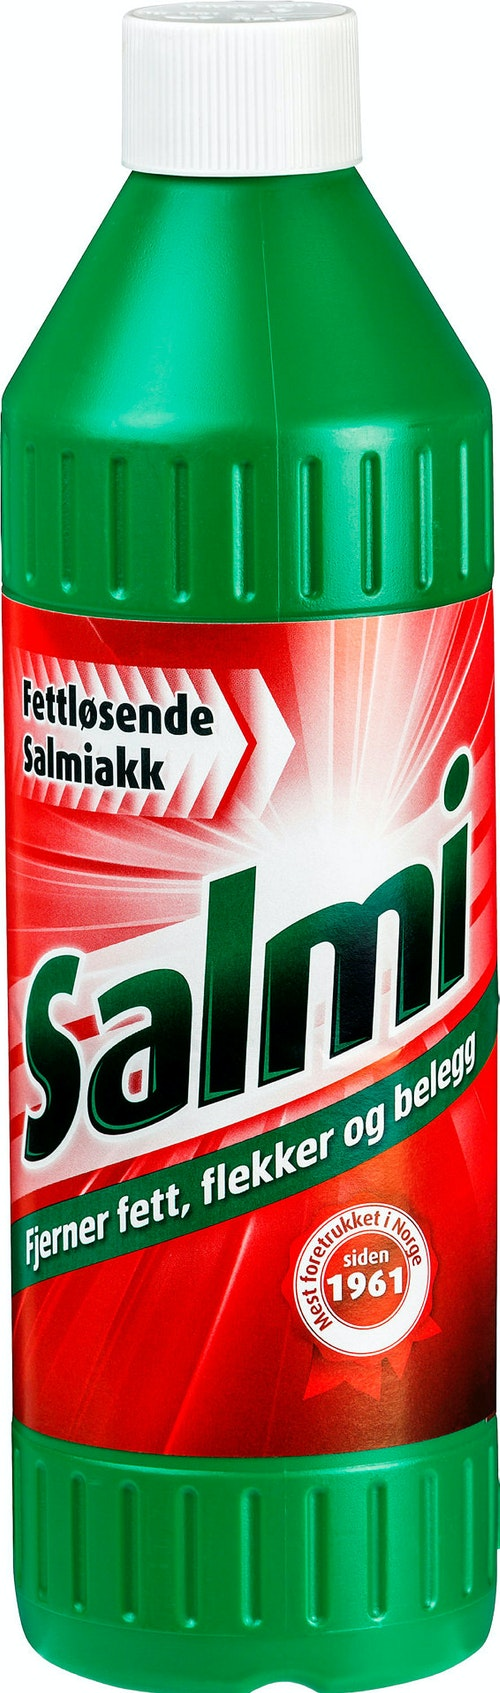 Salmi Salmi rengjøring 750 ml